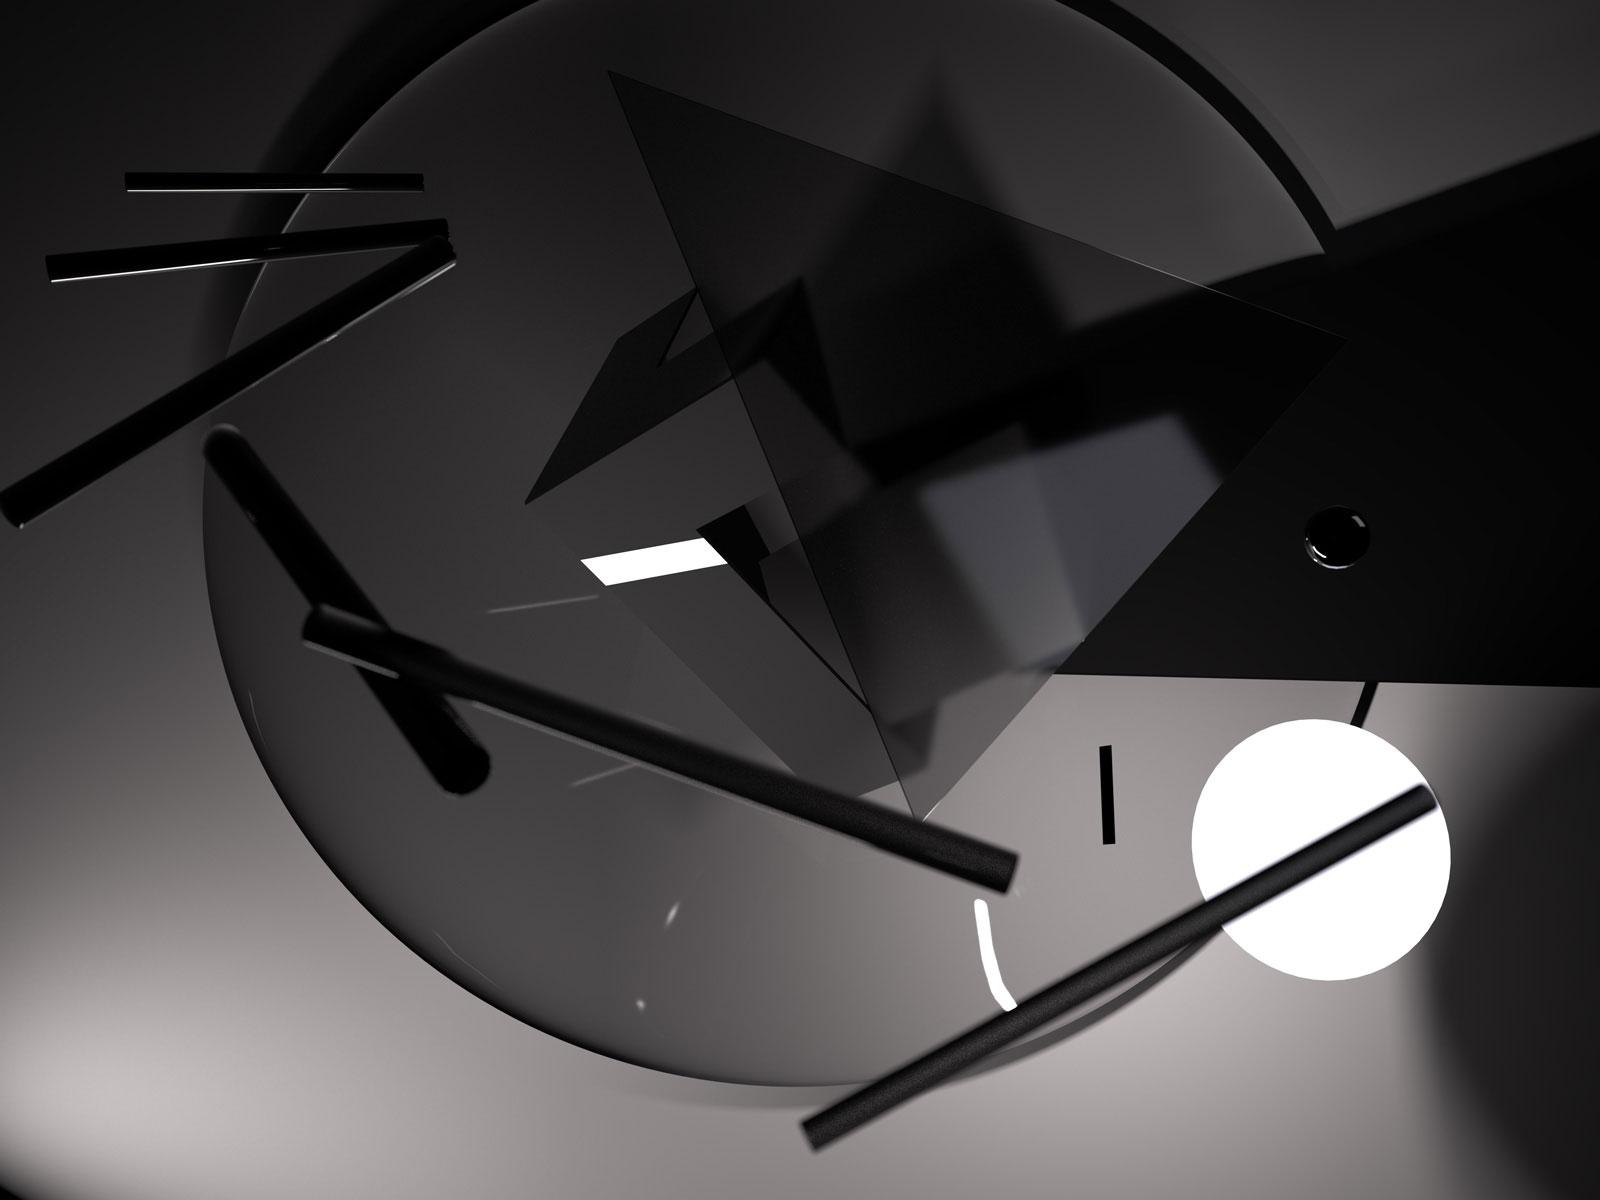 Composition II 02, CGI Fine Art Print, 64 x 86 cm, 2012